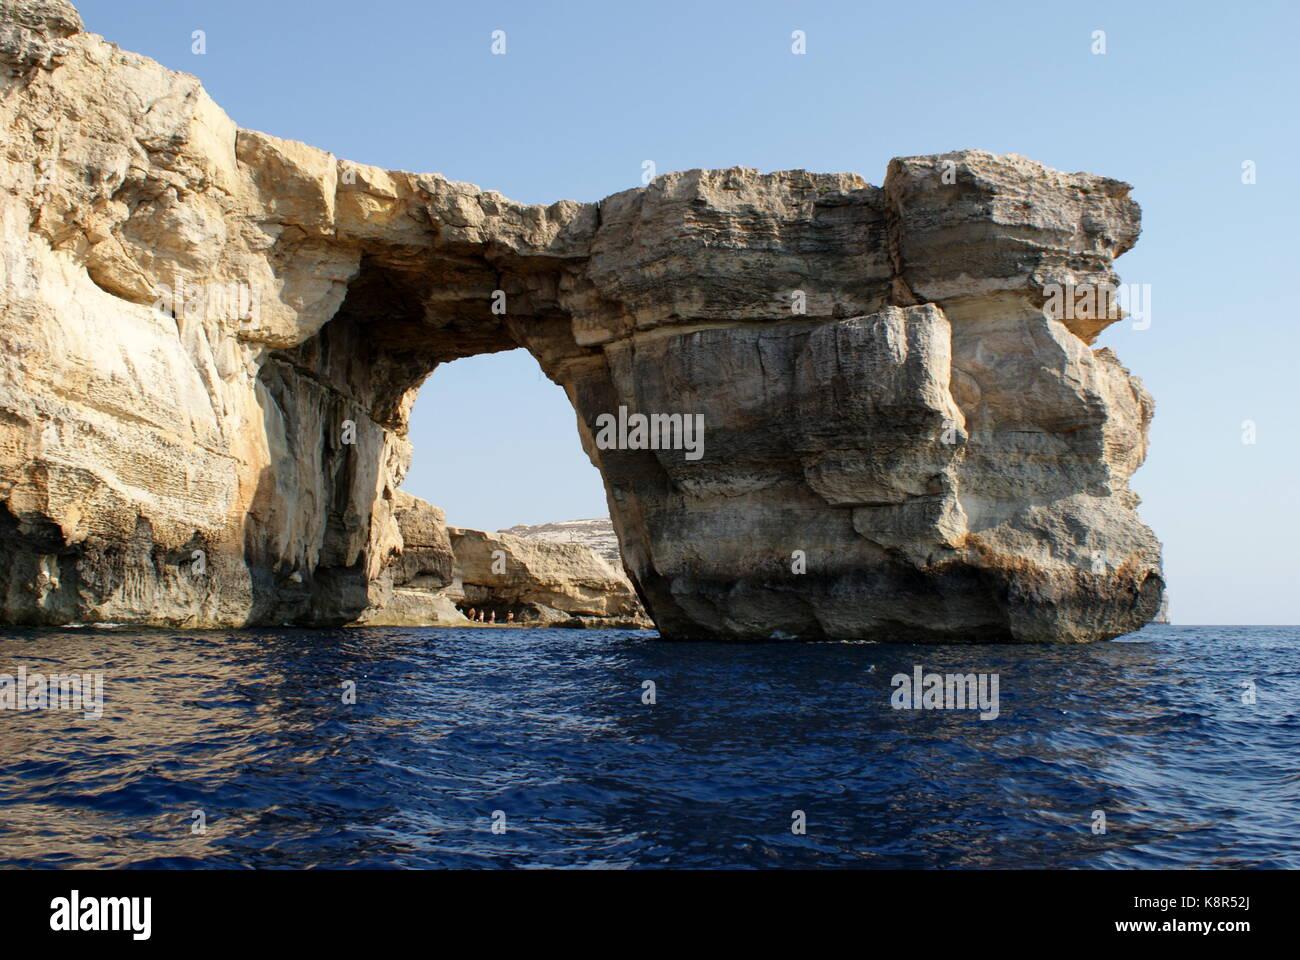 The Azure window, Dwejra bay, San Lawrenz, Gozo, Malta Stock Photo